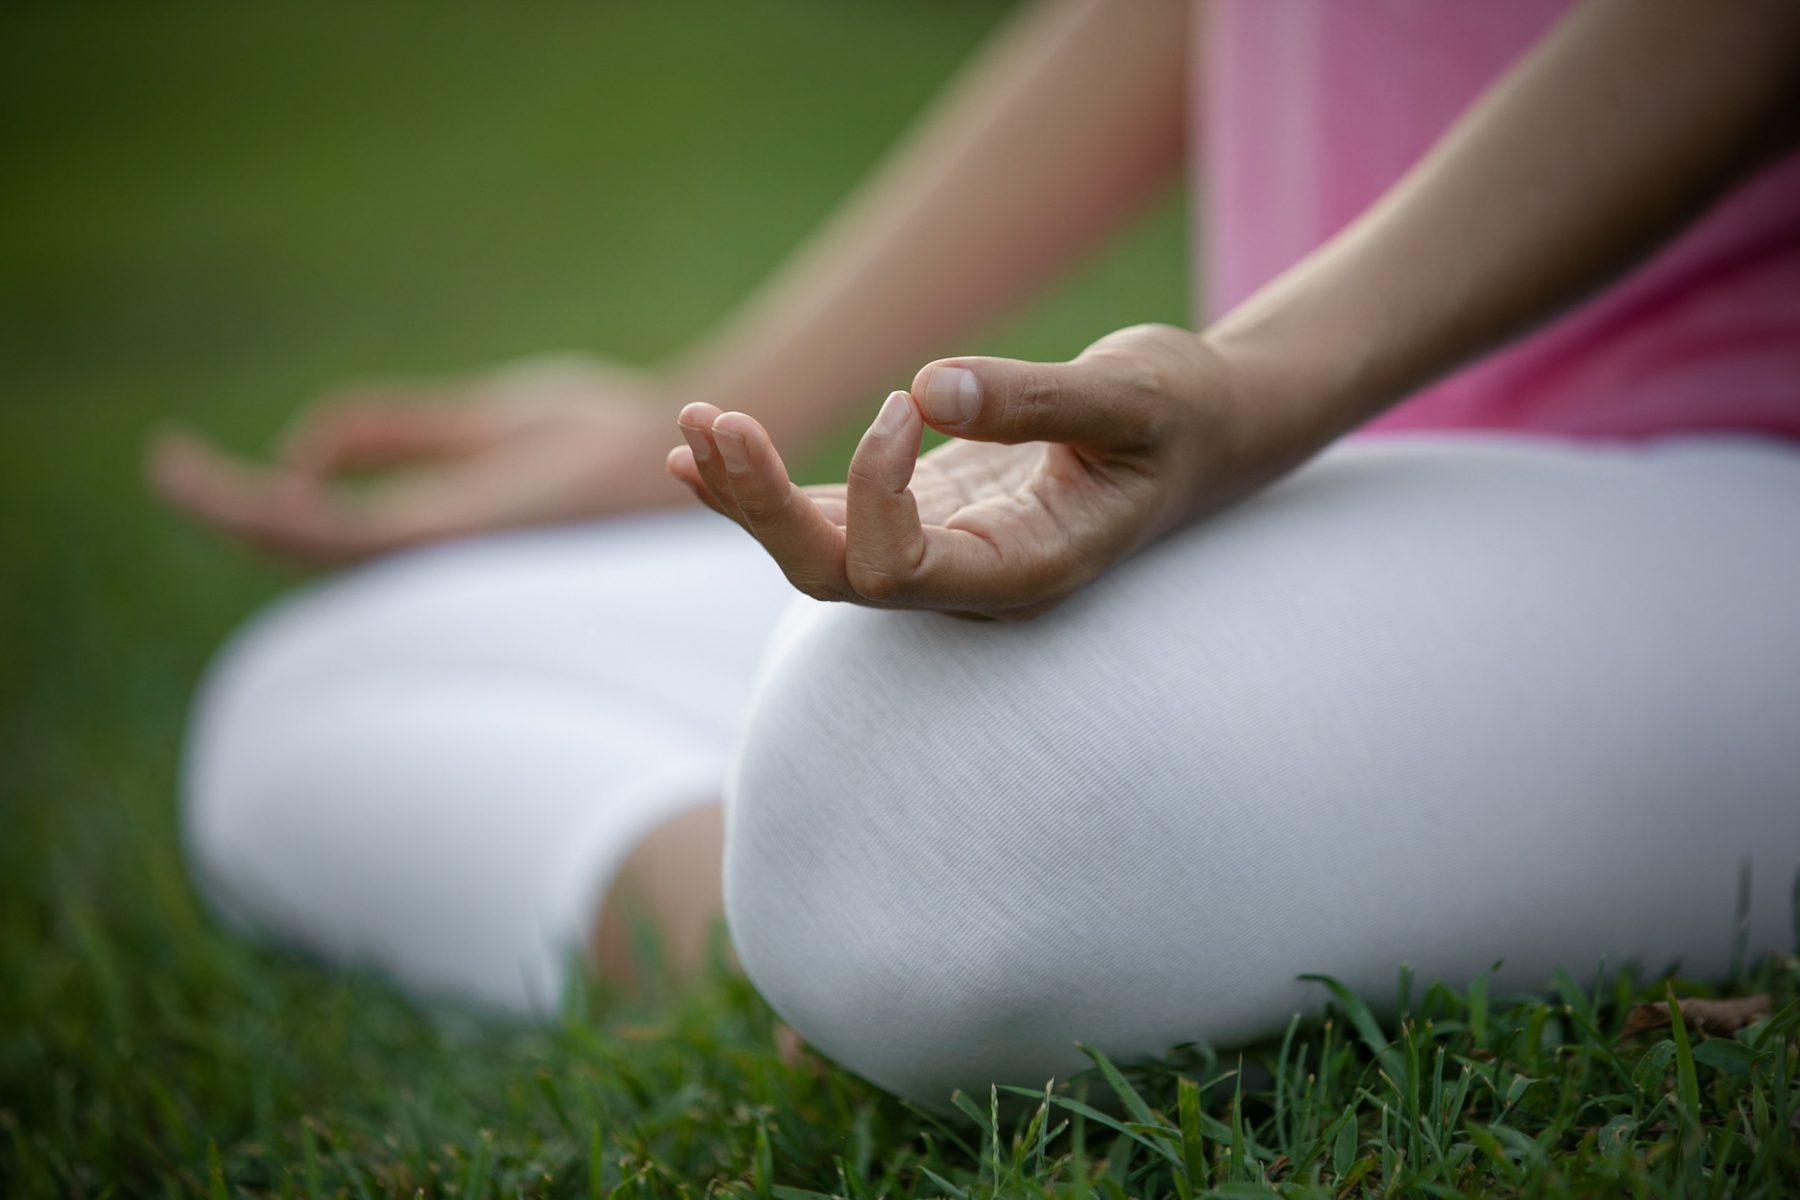 The Foundations of Meditation Retreat at the Sivananda Yoga Ranch